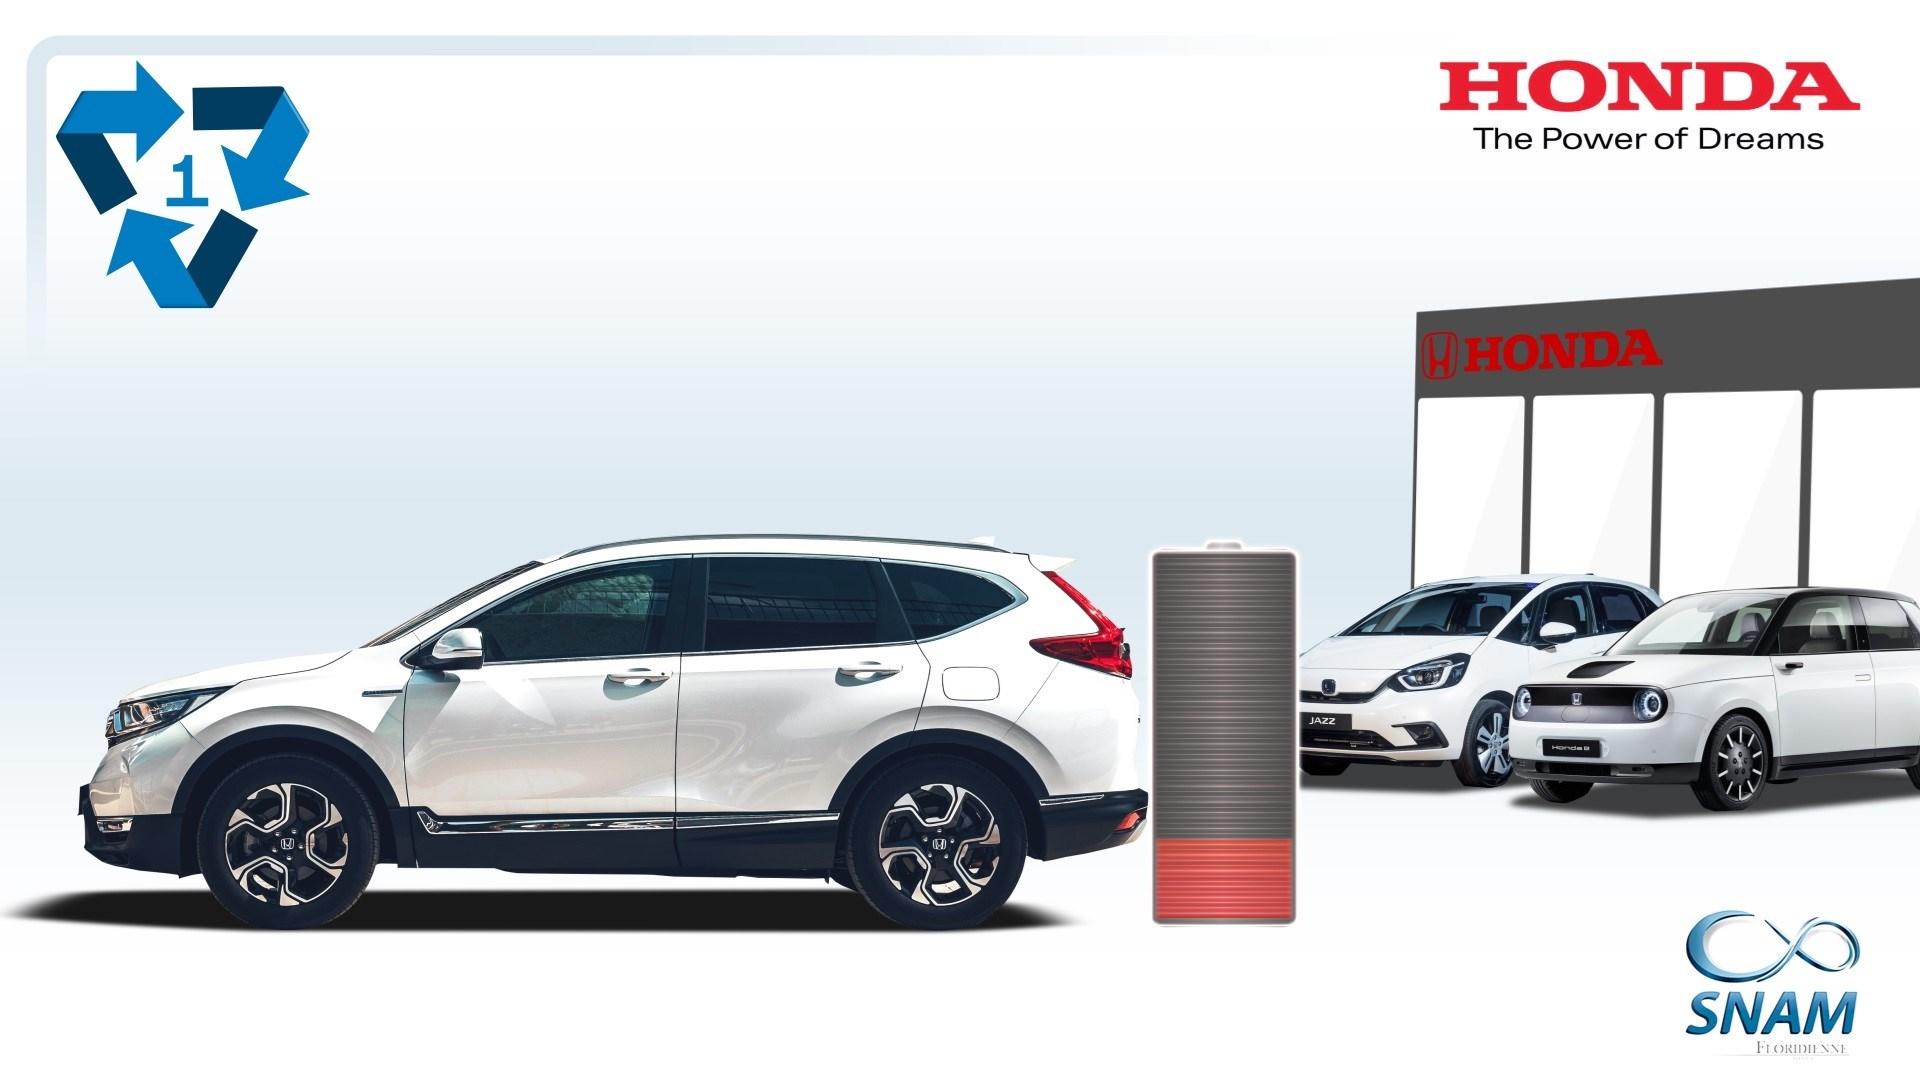 203372 Honda Hybrid EV Batteries Recycling